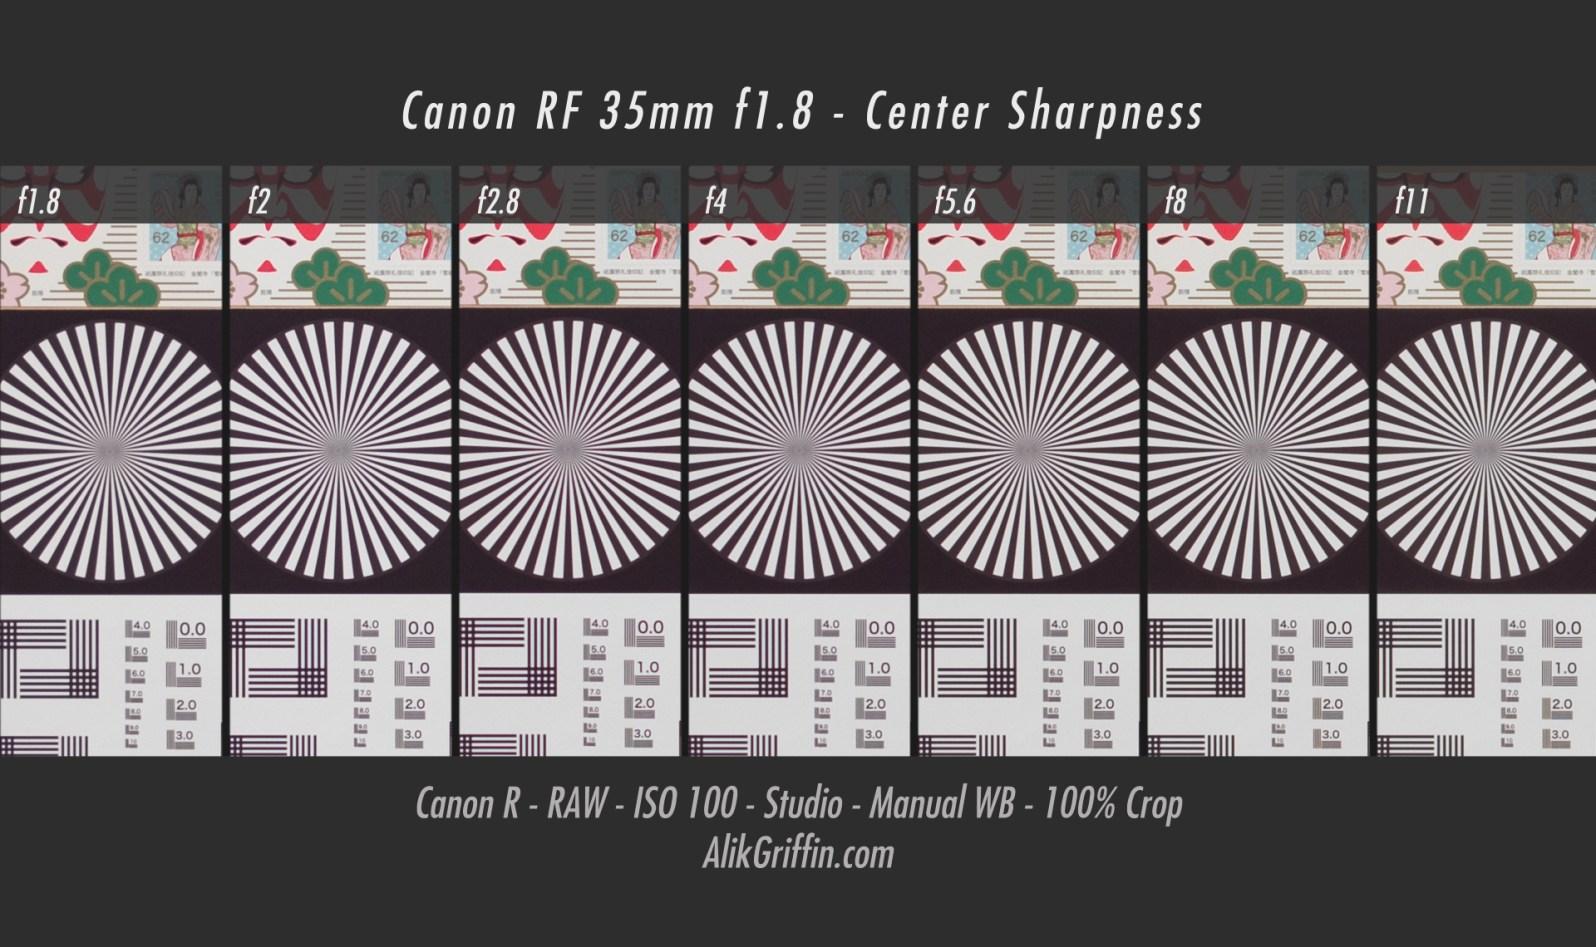 AlikGriffin_CanonRF35mmf1.8_Sharpness_Center